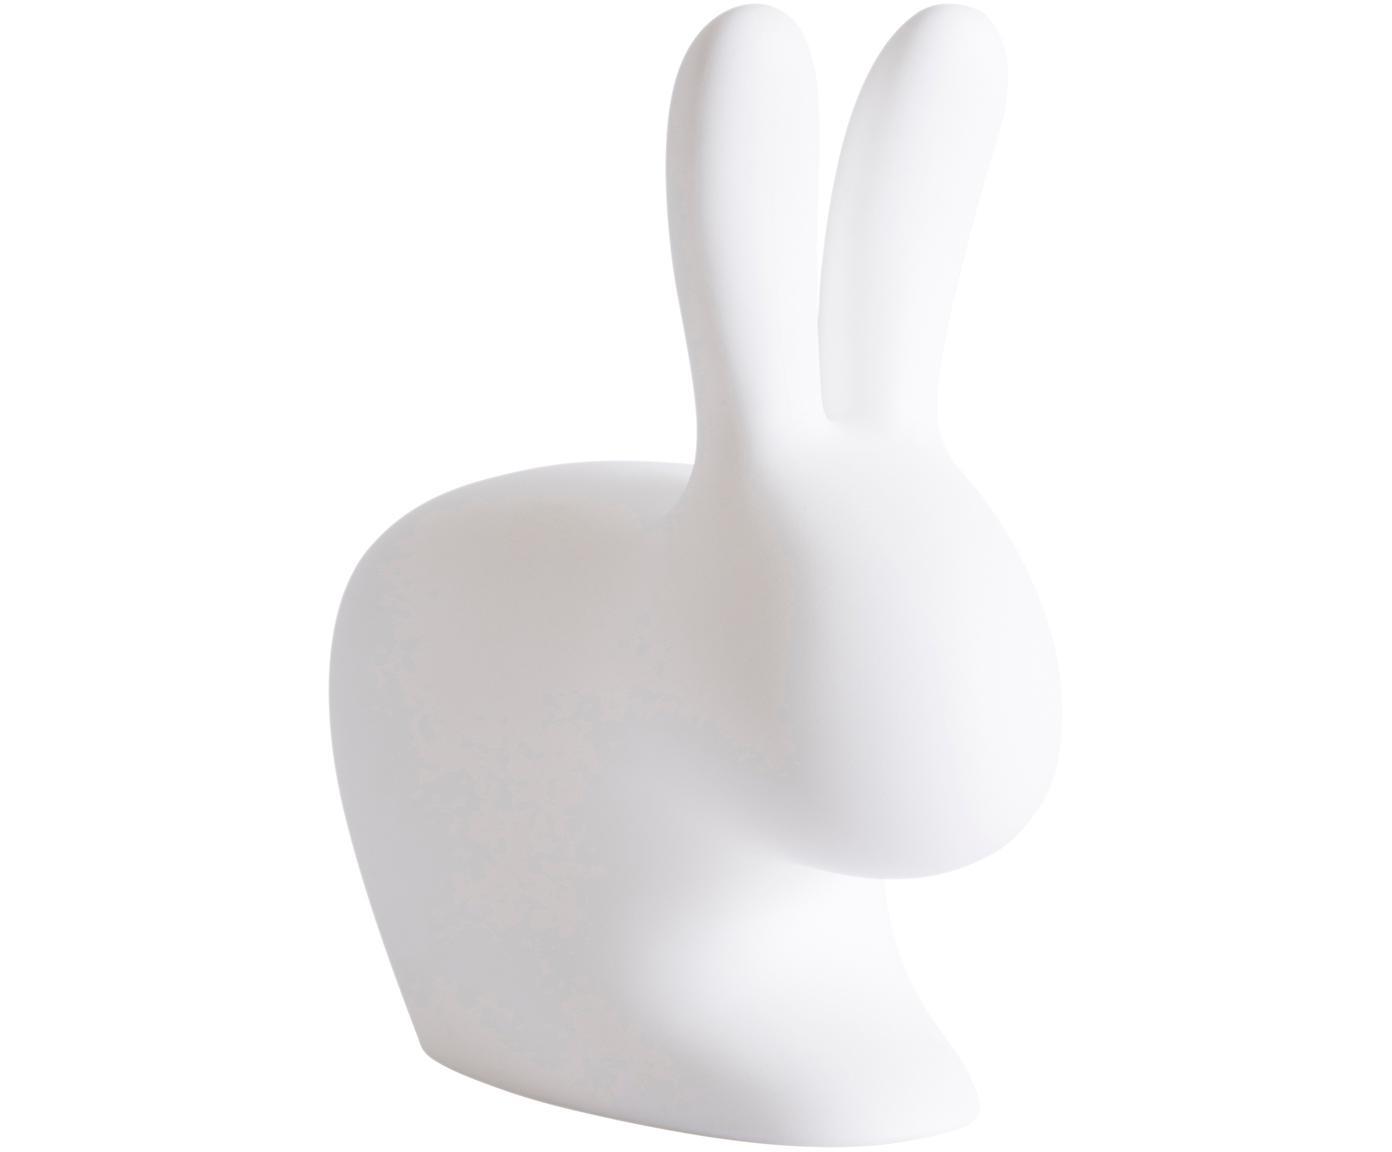 Vloerlamp Rabbit, Kunststof (polyethyleen), Wit, 46 x 53 cm